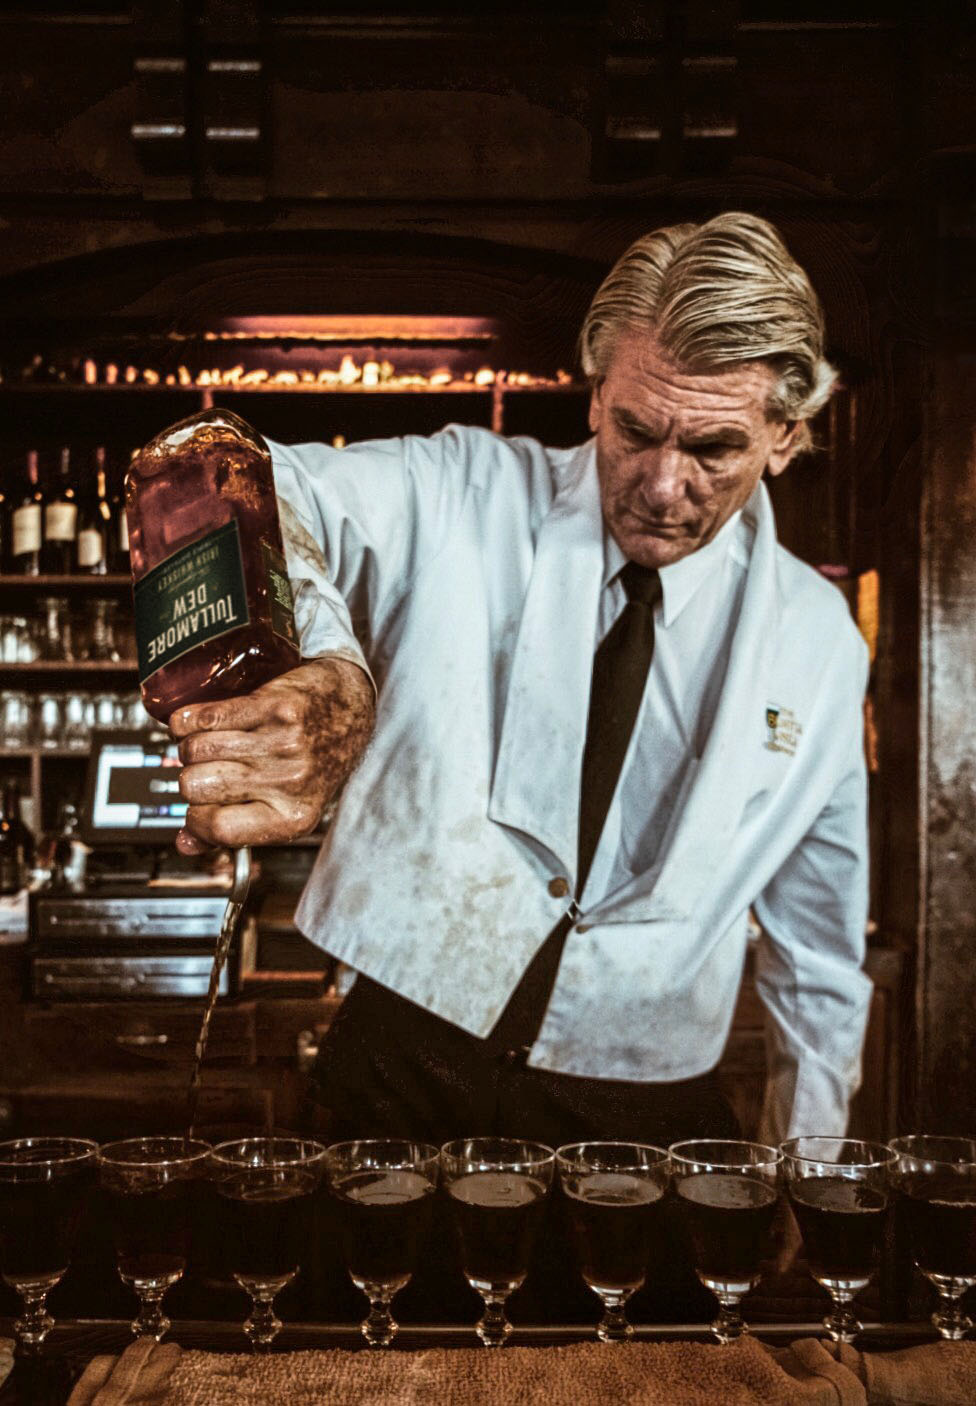 Paul Nolan, Bartender at The Buena Vista Cafe, San Francisco, CA